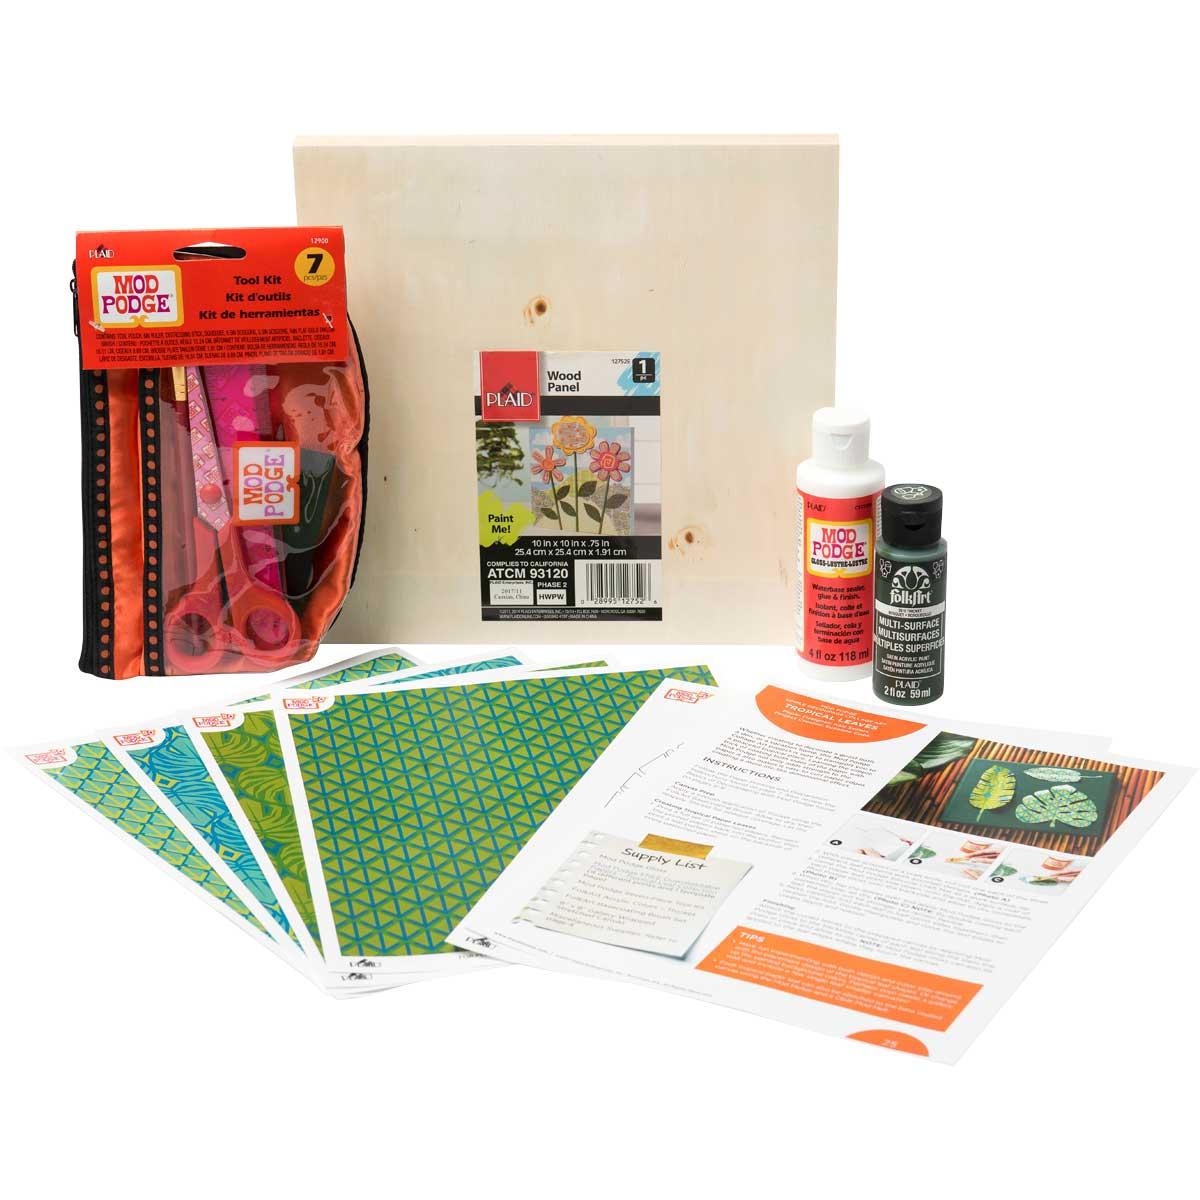 Mod Podge ® Project Kit